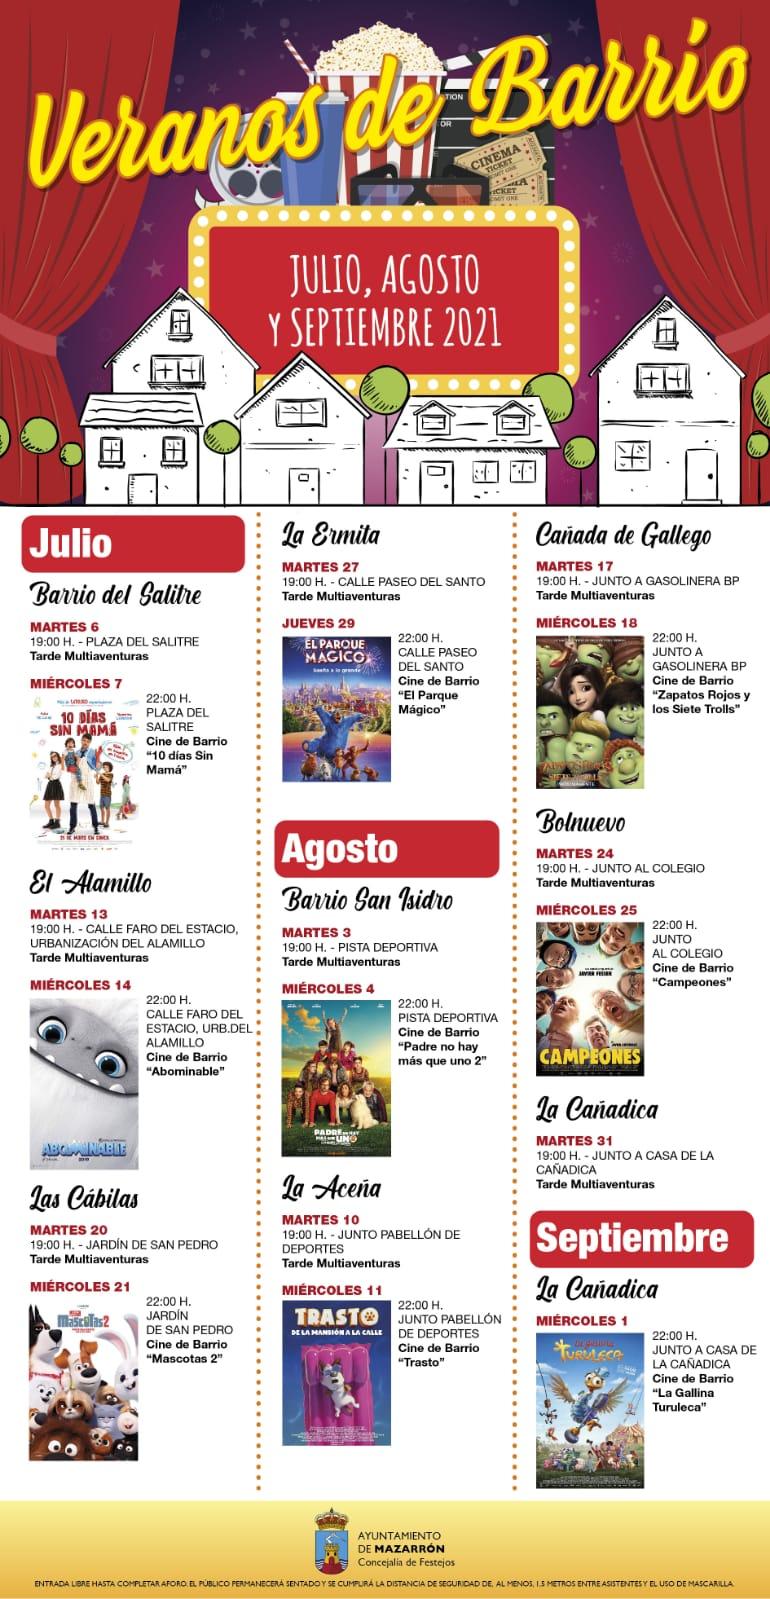 Start of 'Veranos de Barrio'